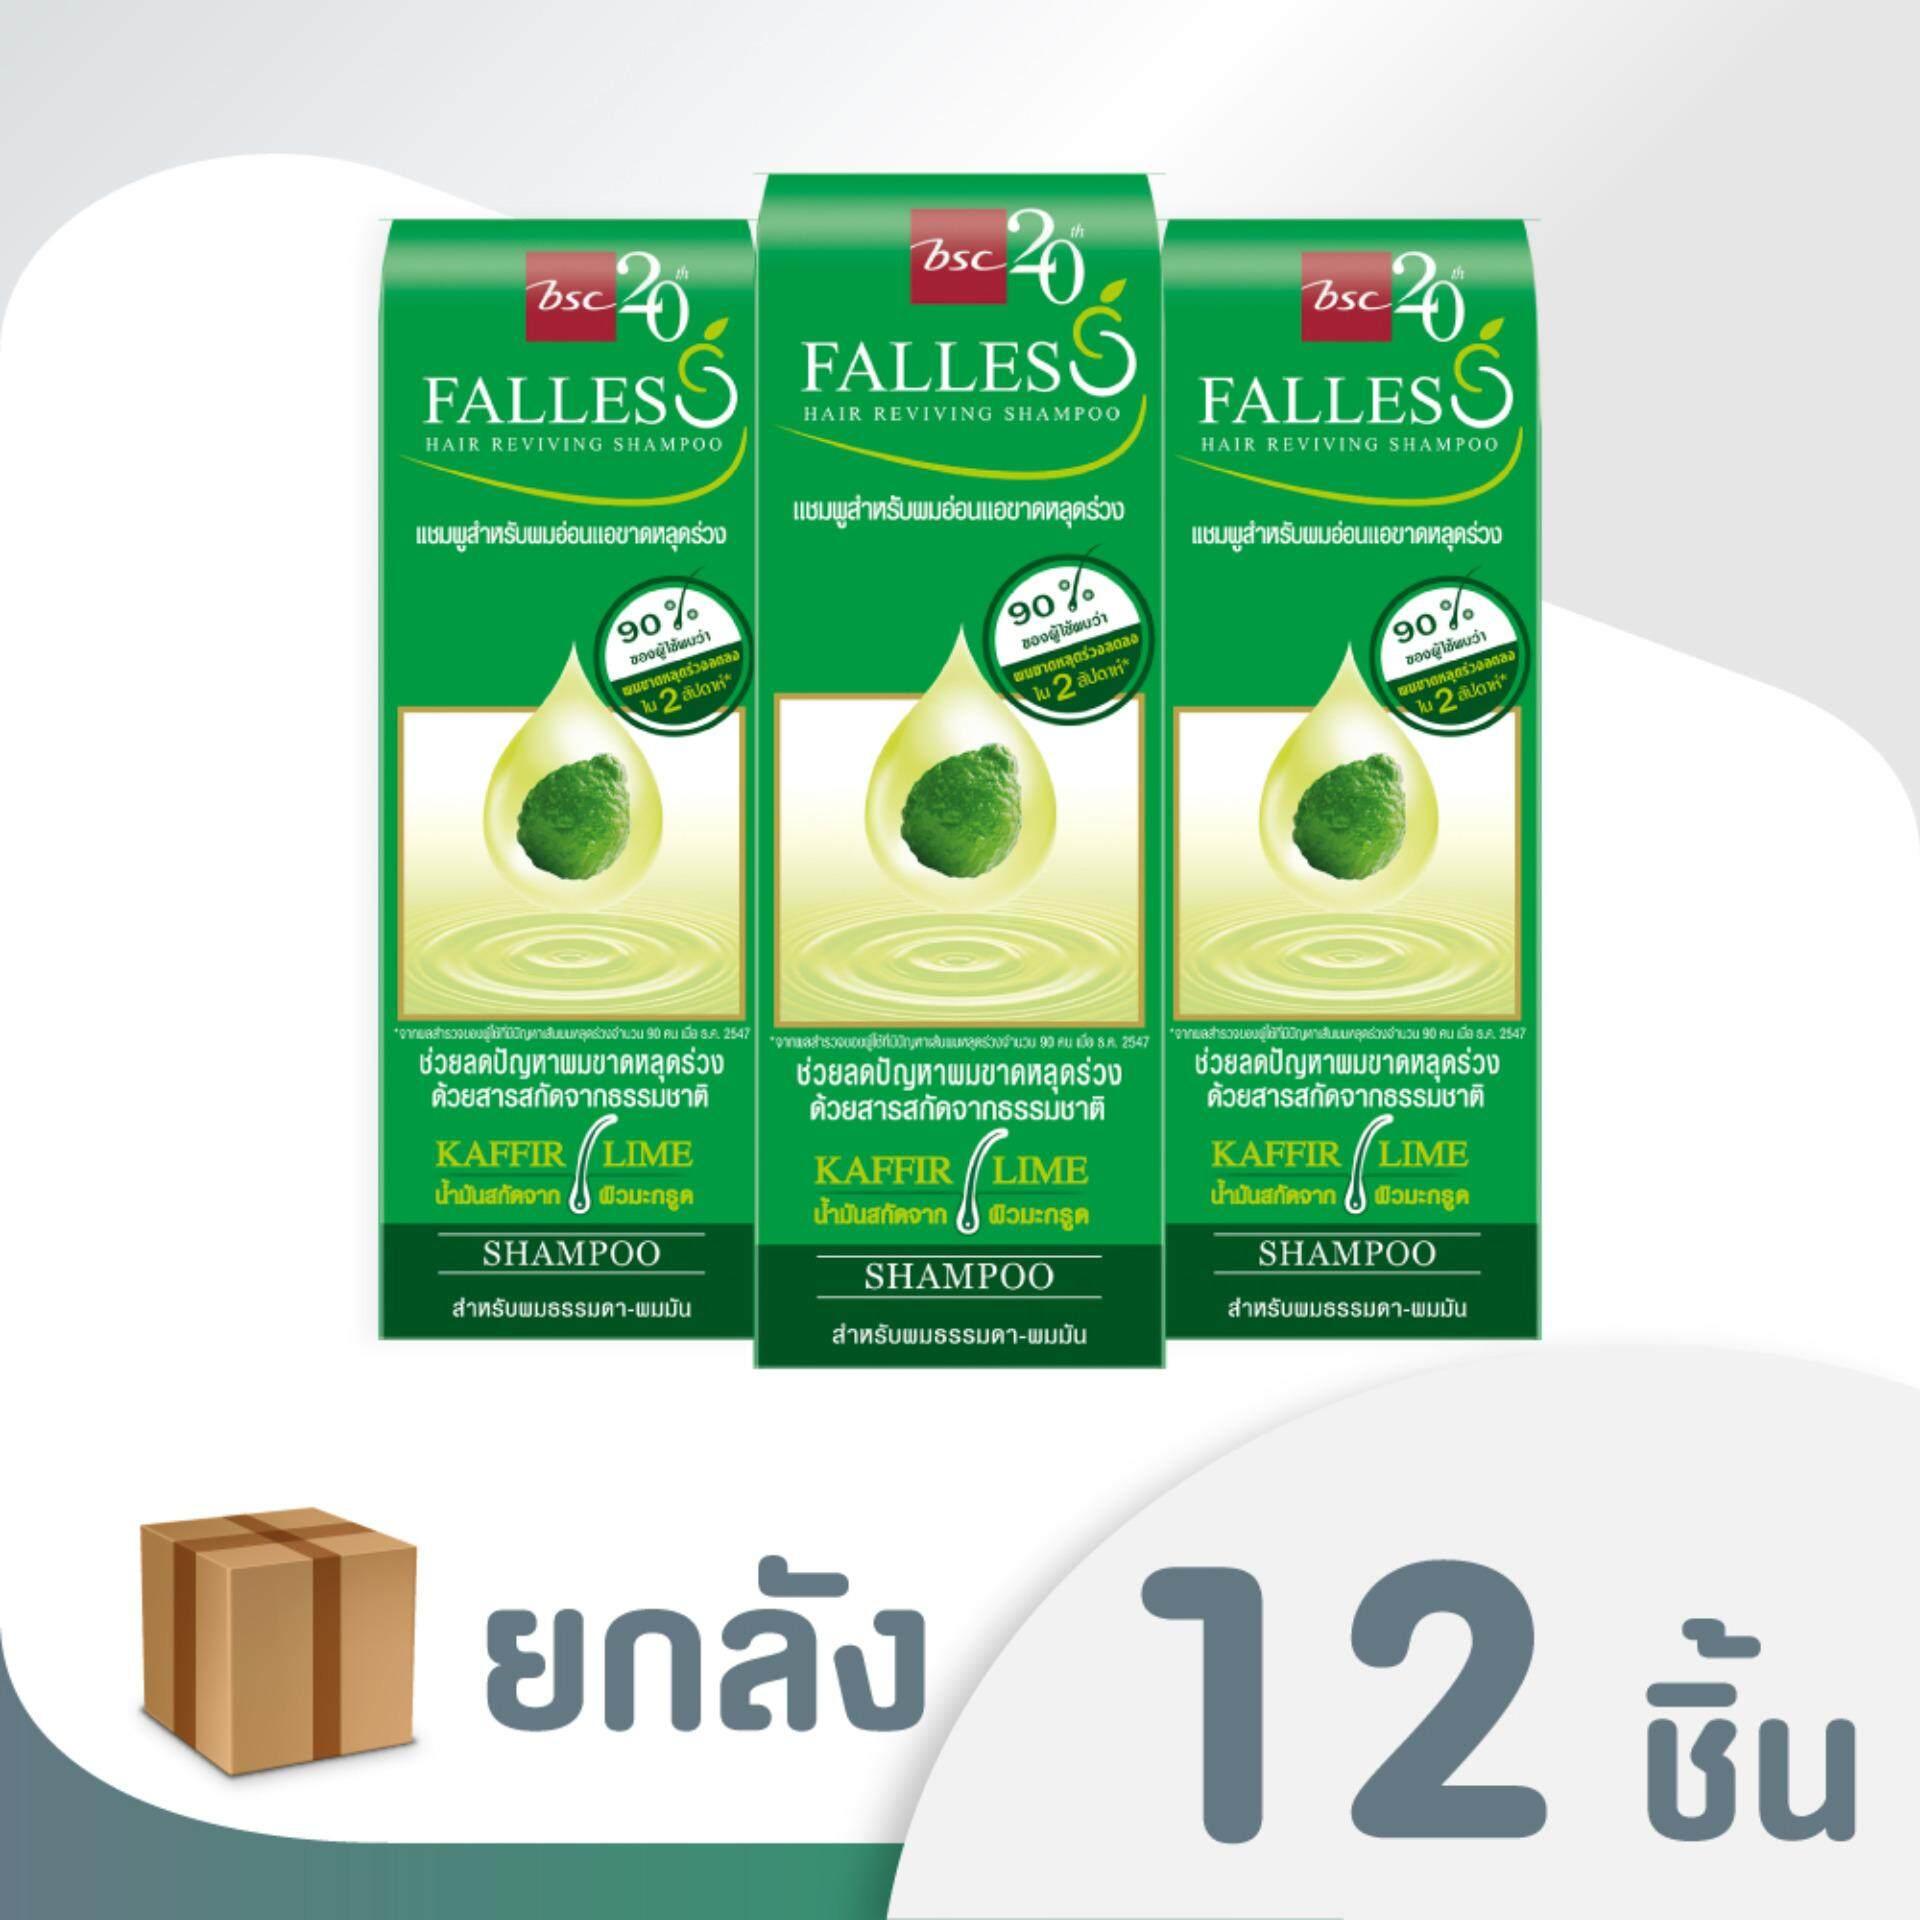 Falless แชมพู ฟอลเลส สูตรผมแข็งแรงสุขภาพดี 180 มล 12 ขวด ยกลัง กรุงเทพมหานคร